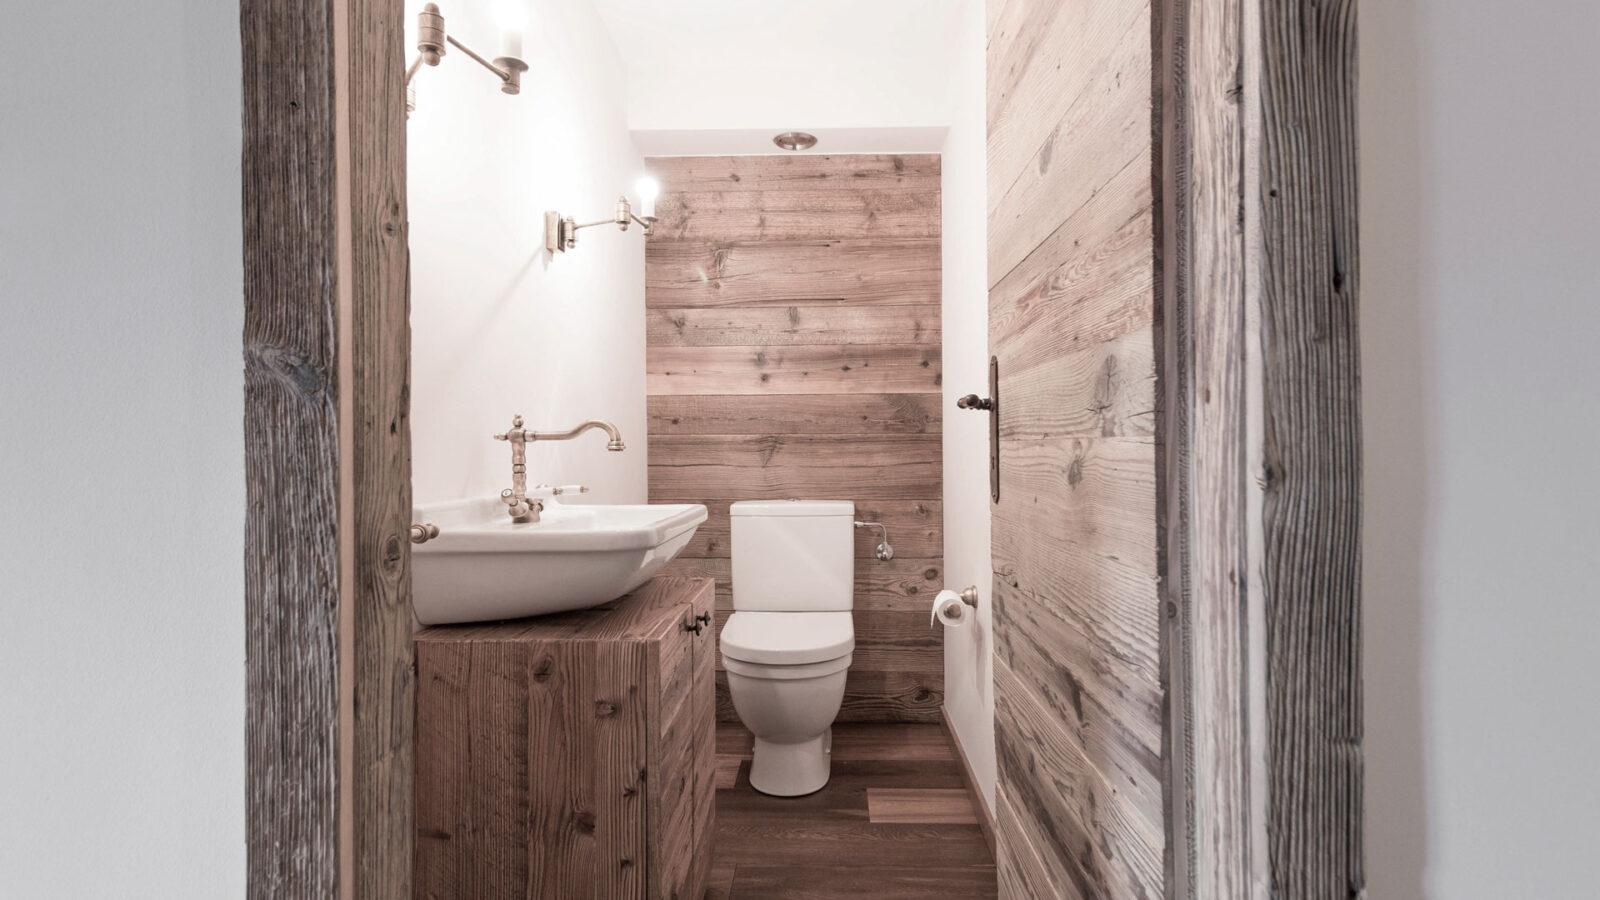 CSDK - Appartement - Verbier - Transformation - Salle de bain